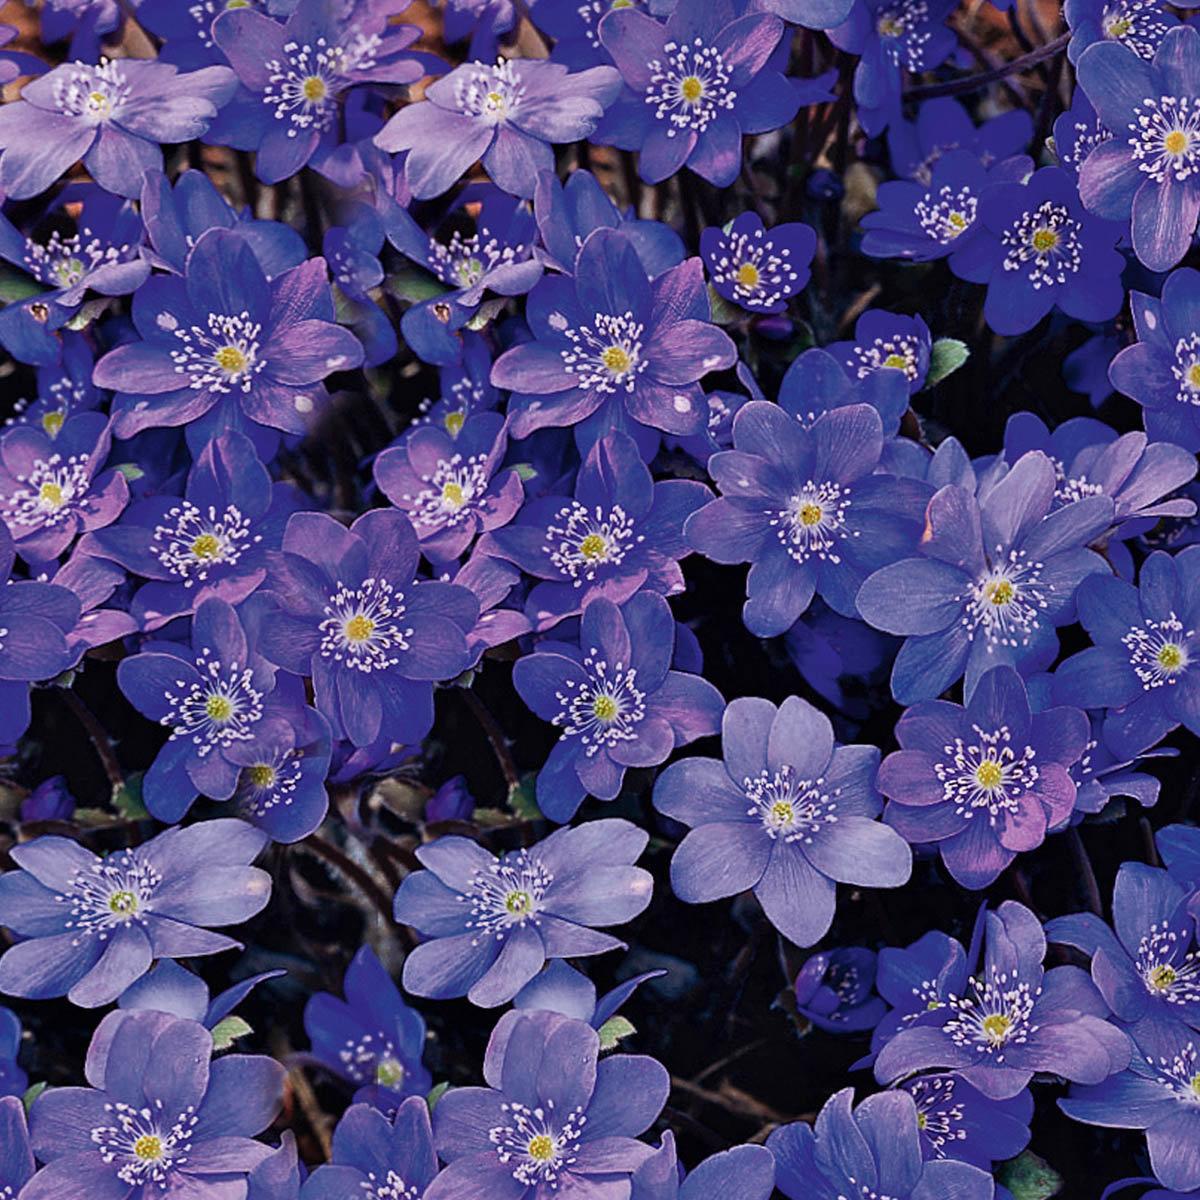 Leberblümchen Blue Jewel   #2